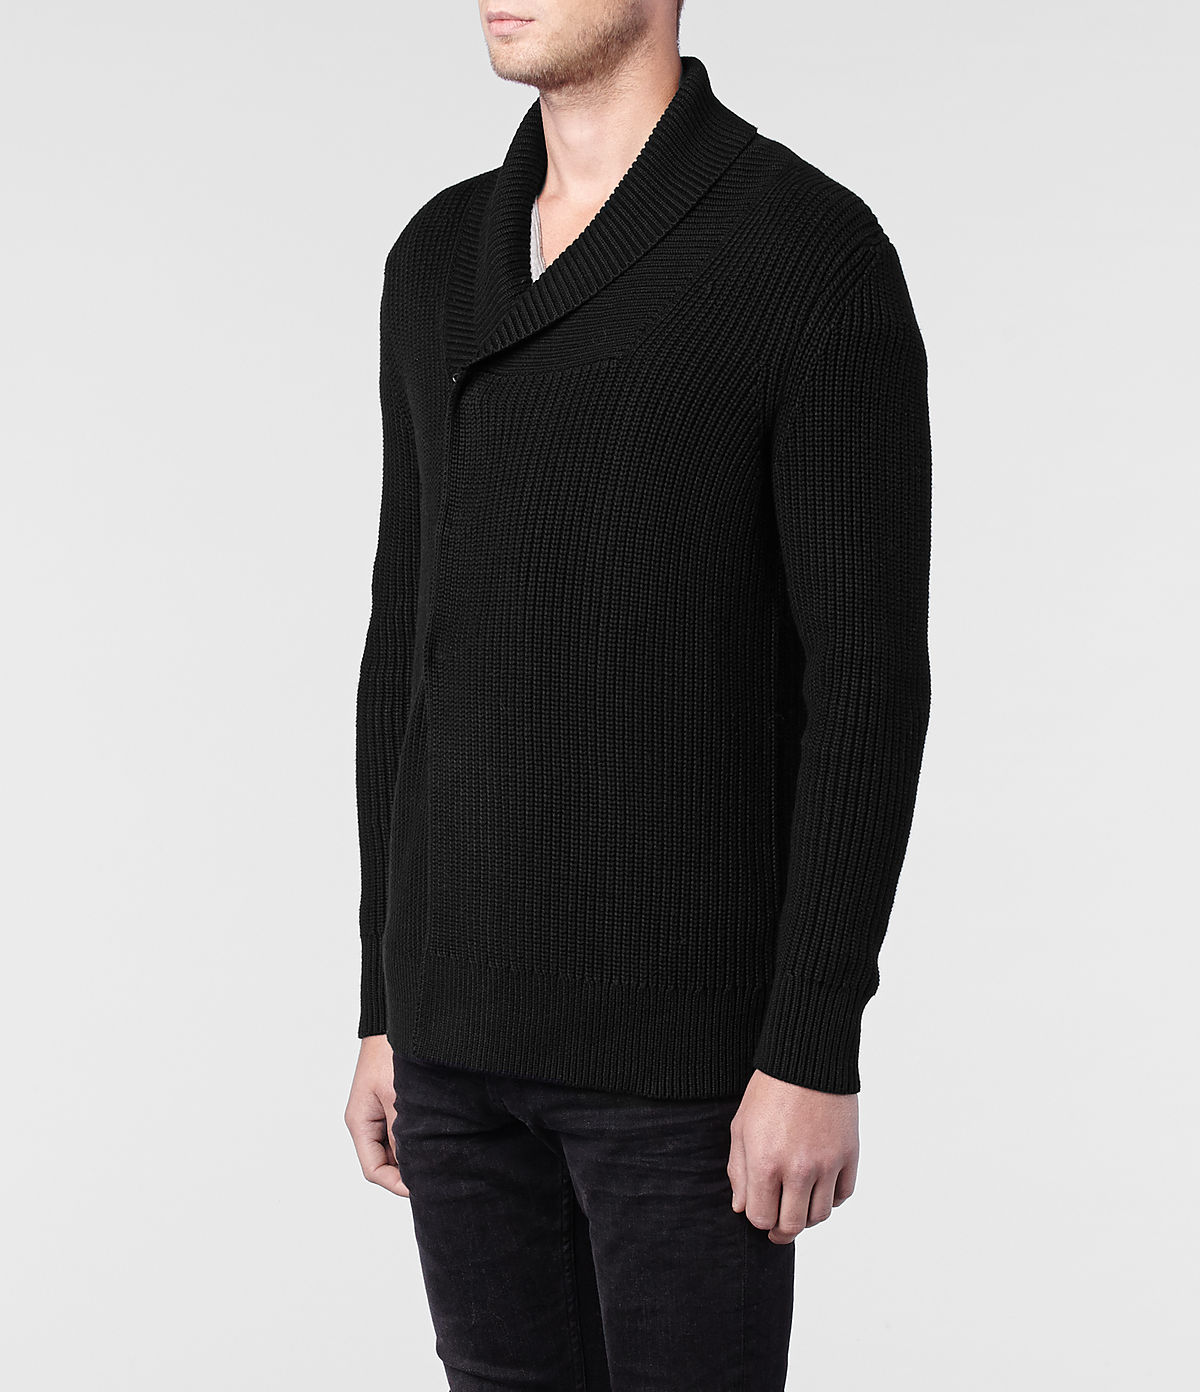 Lyst  Allsaints Rigg Cardigan In Black For Men